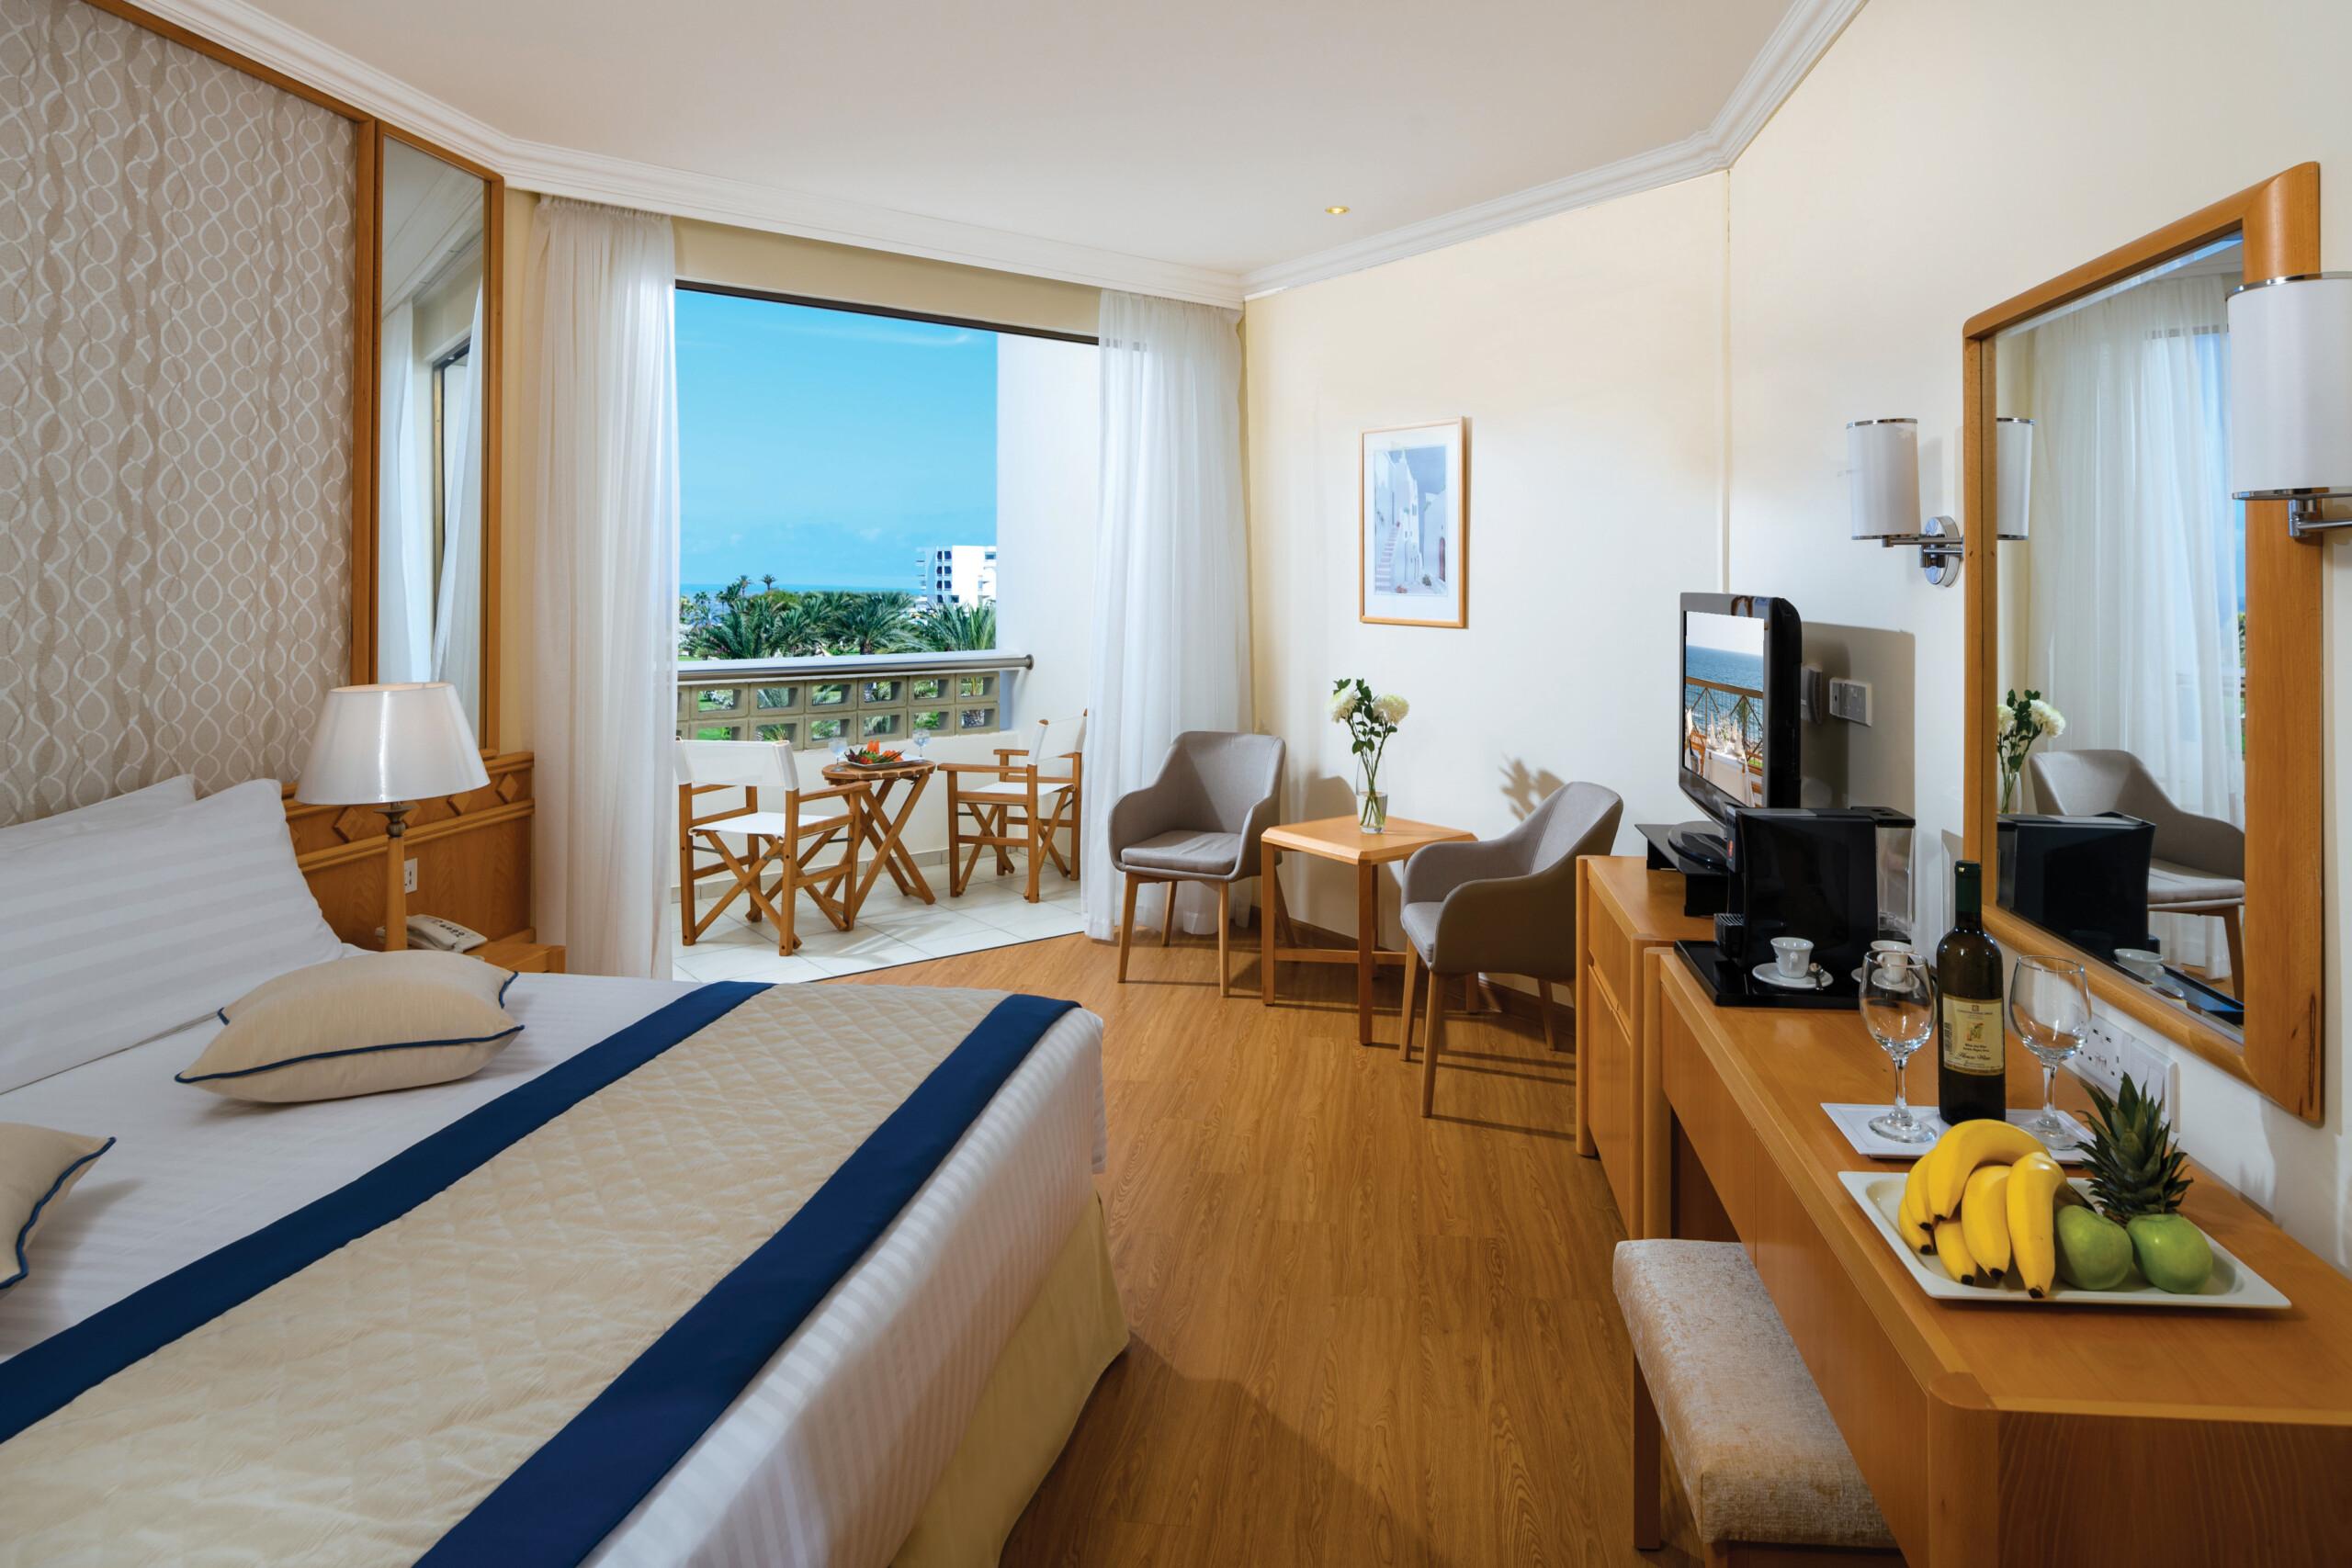 38 ATHENA BEACH HOTEL CLASSIC ROOM LSV